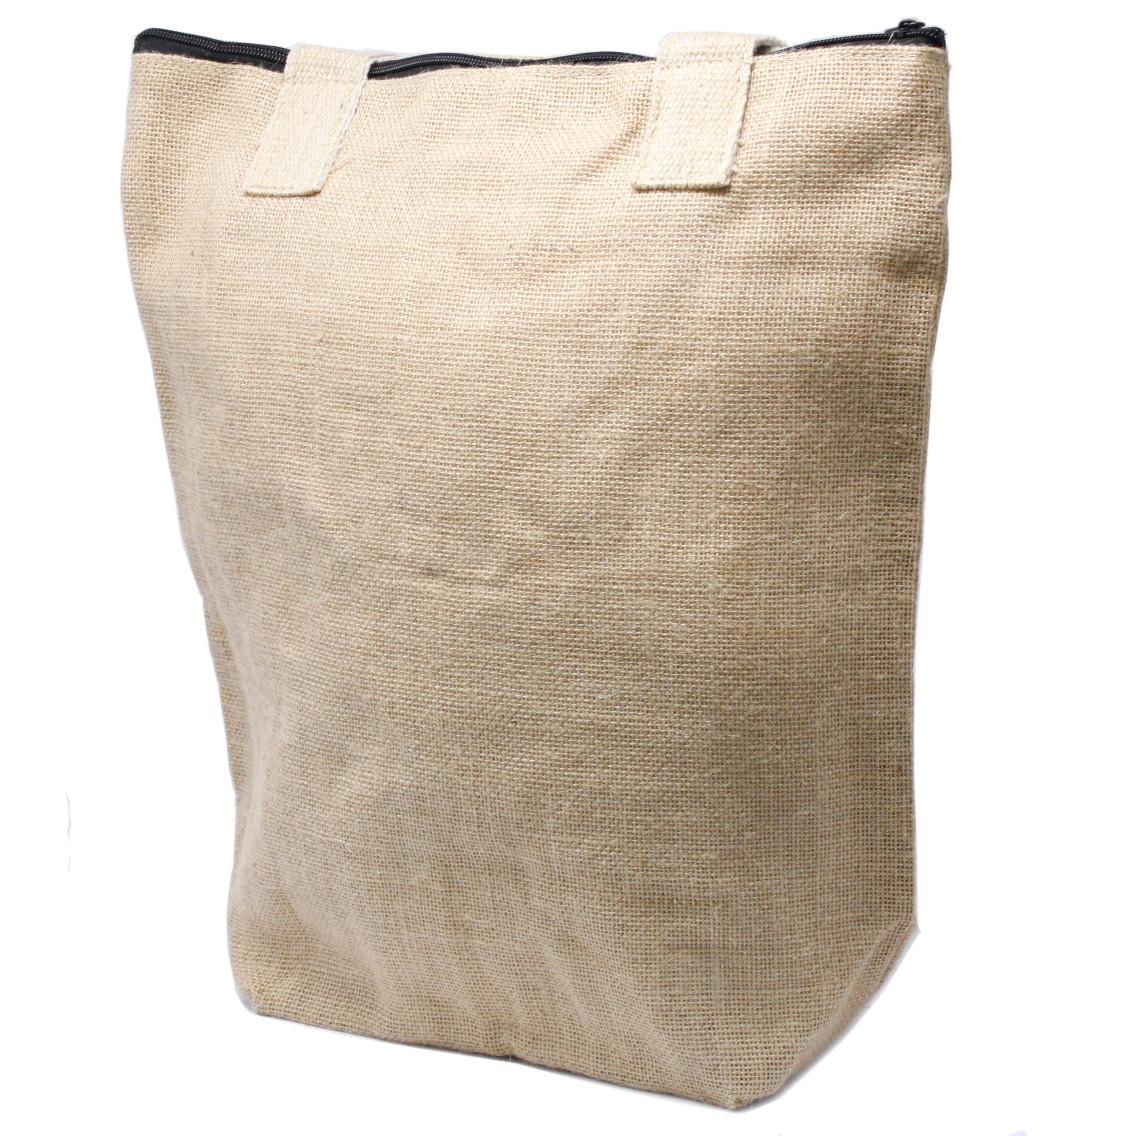 Eco Jute Bag Blank Design